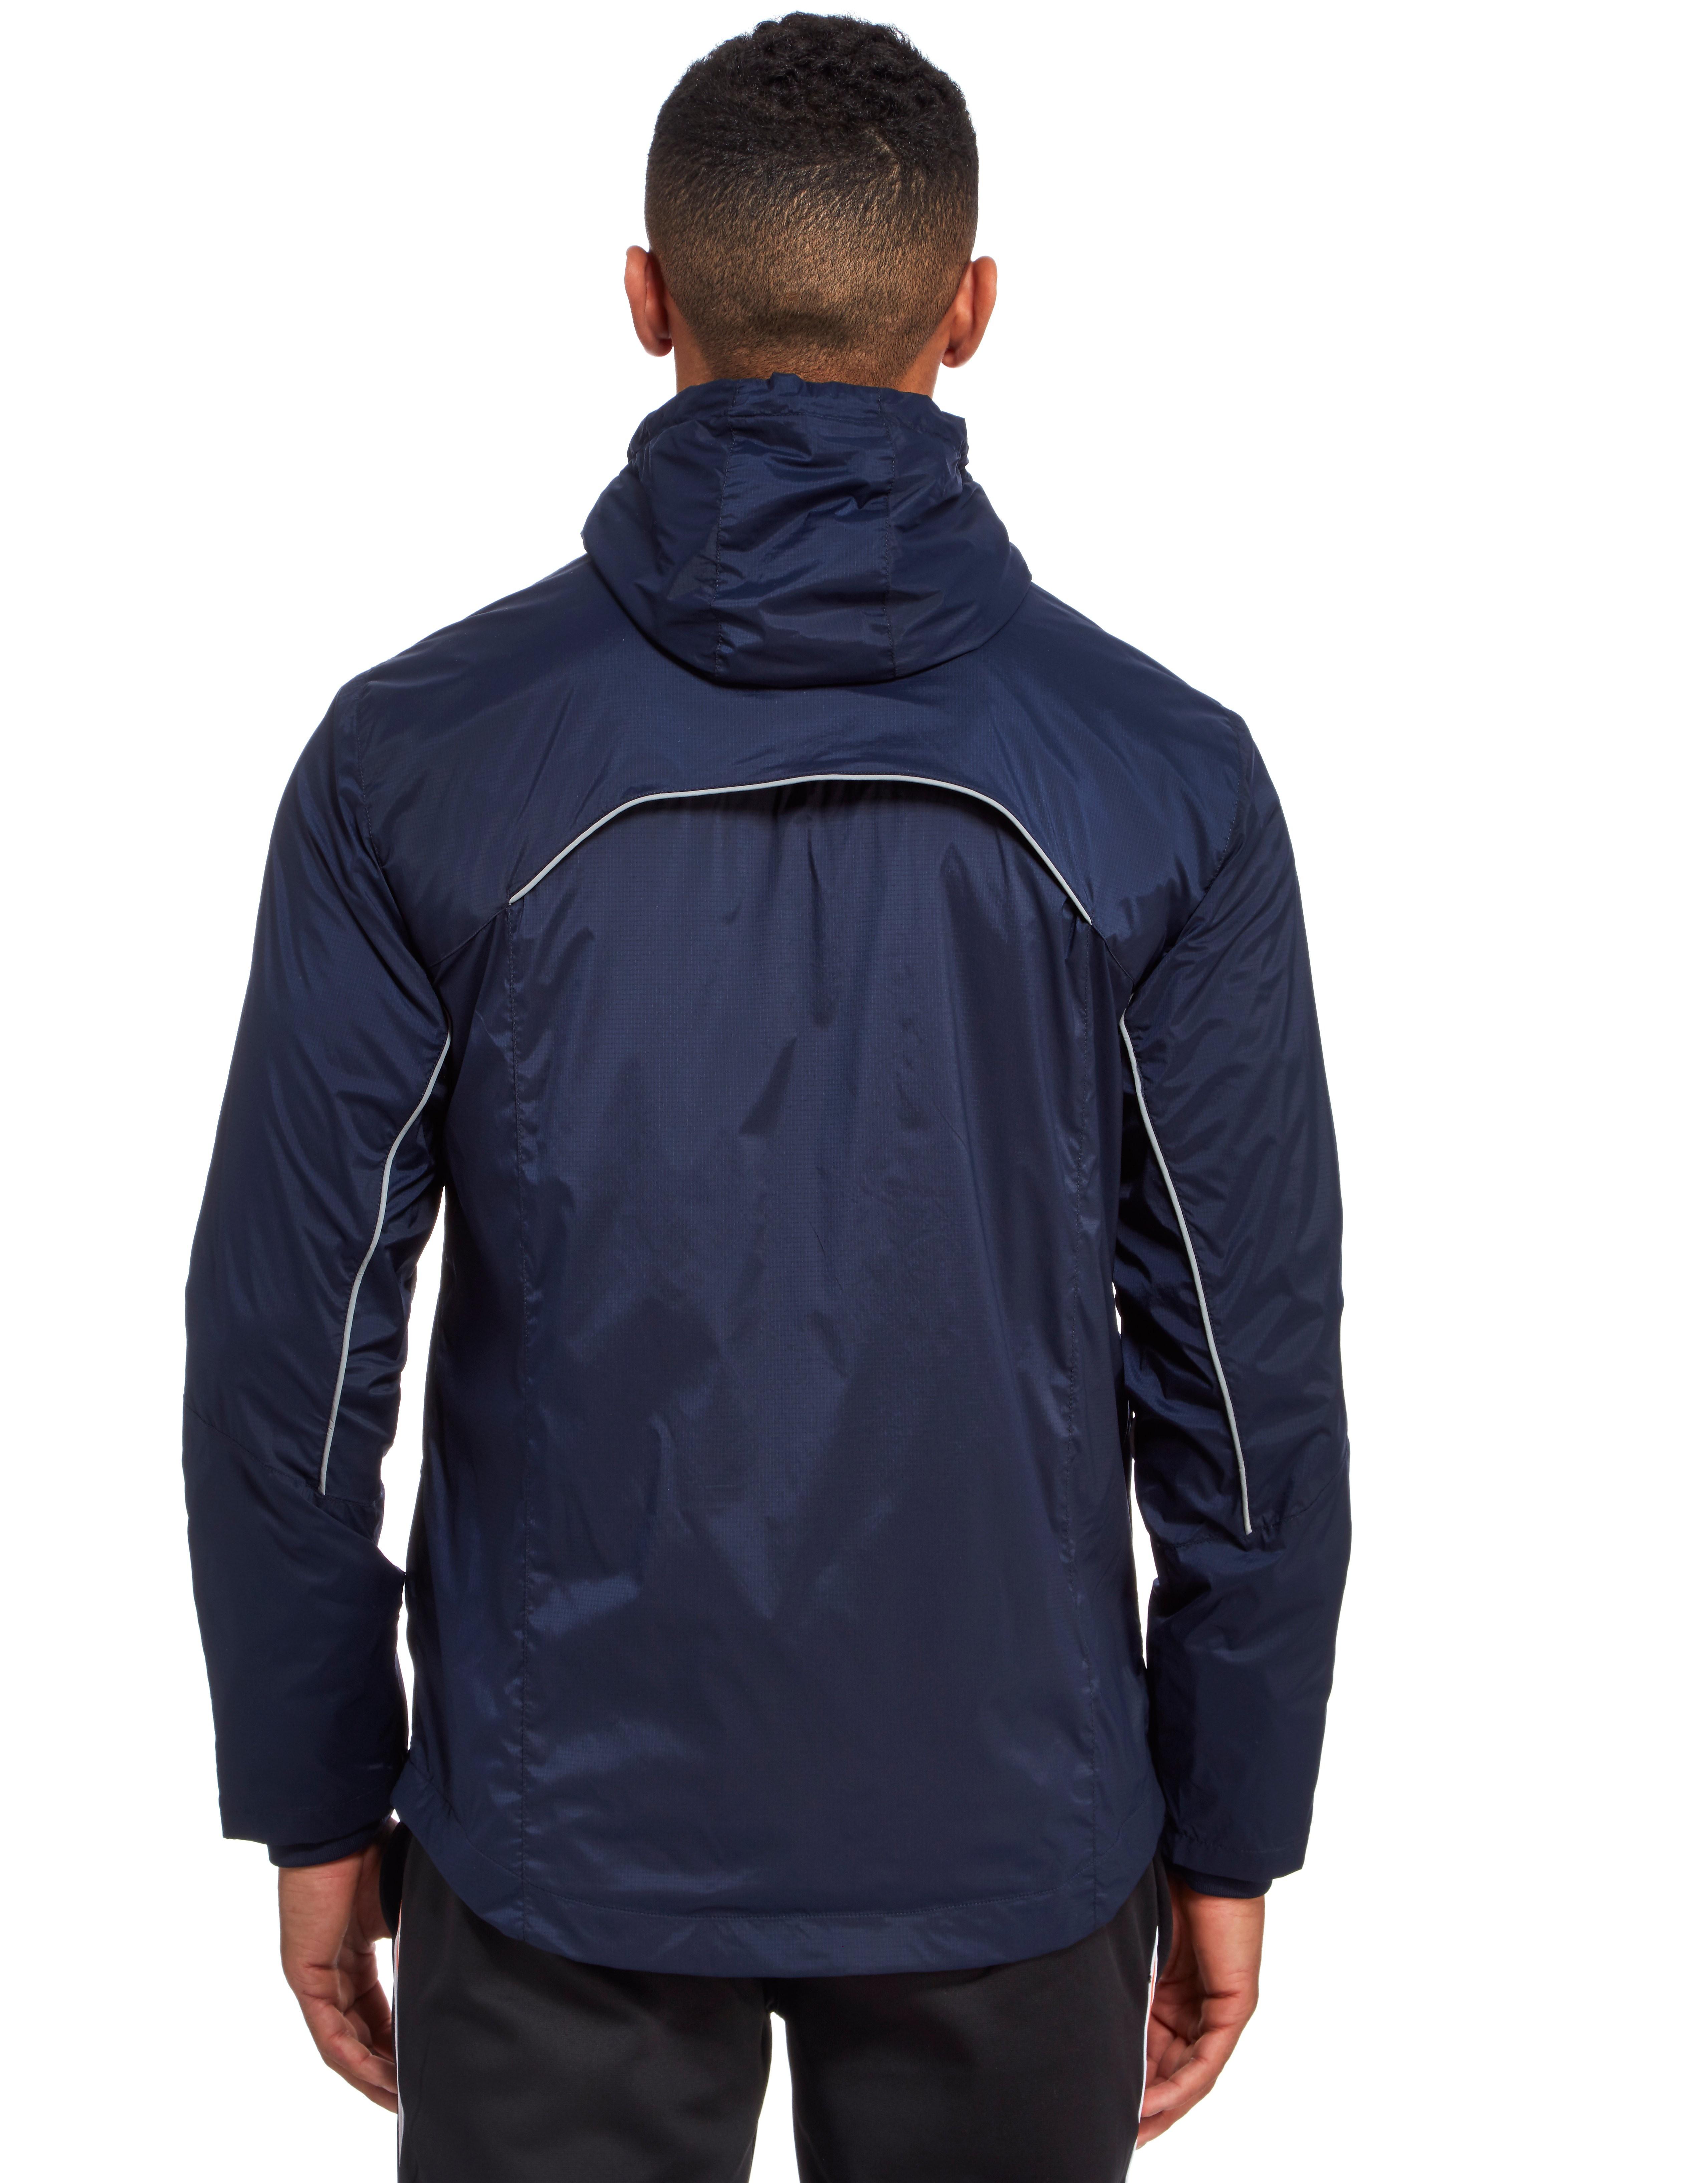 Lyle & Scott Woodhouse Jacket